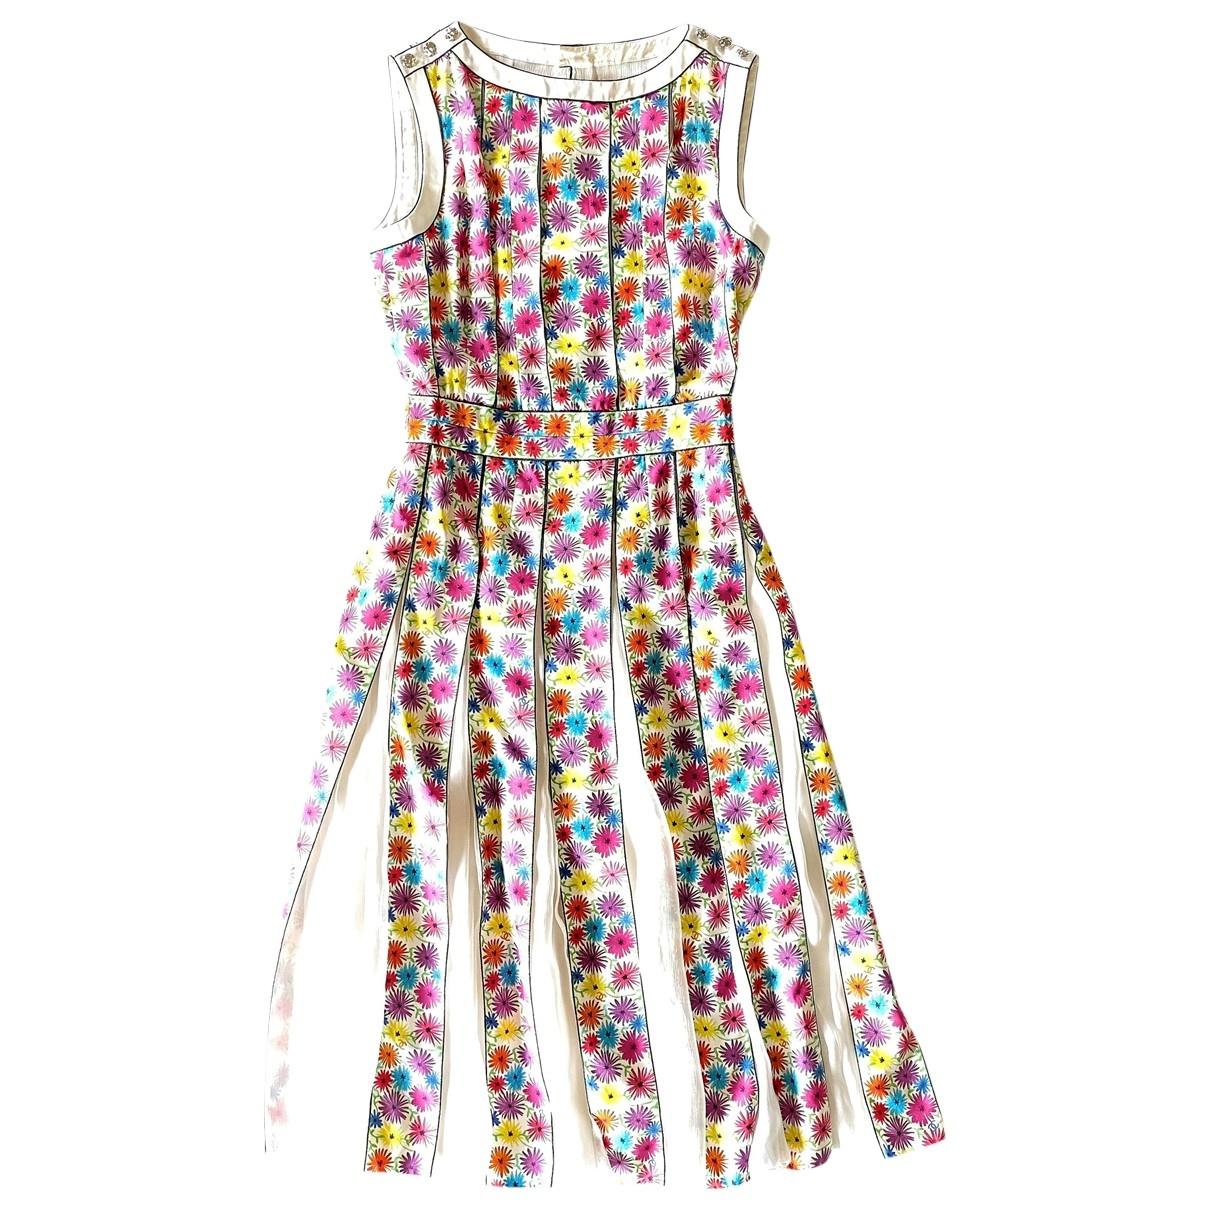 Chanel \N Kleid in  Bunt Seide